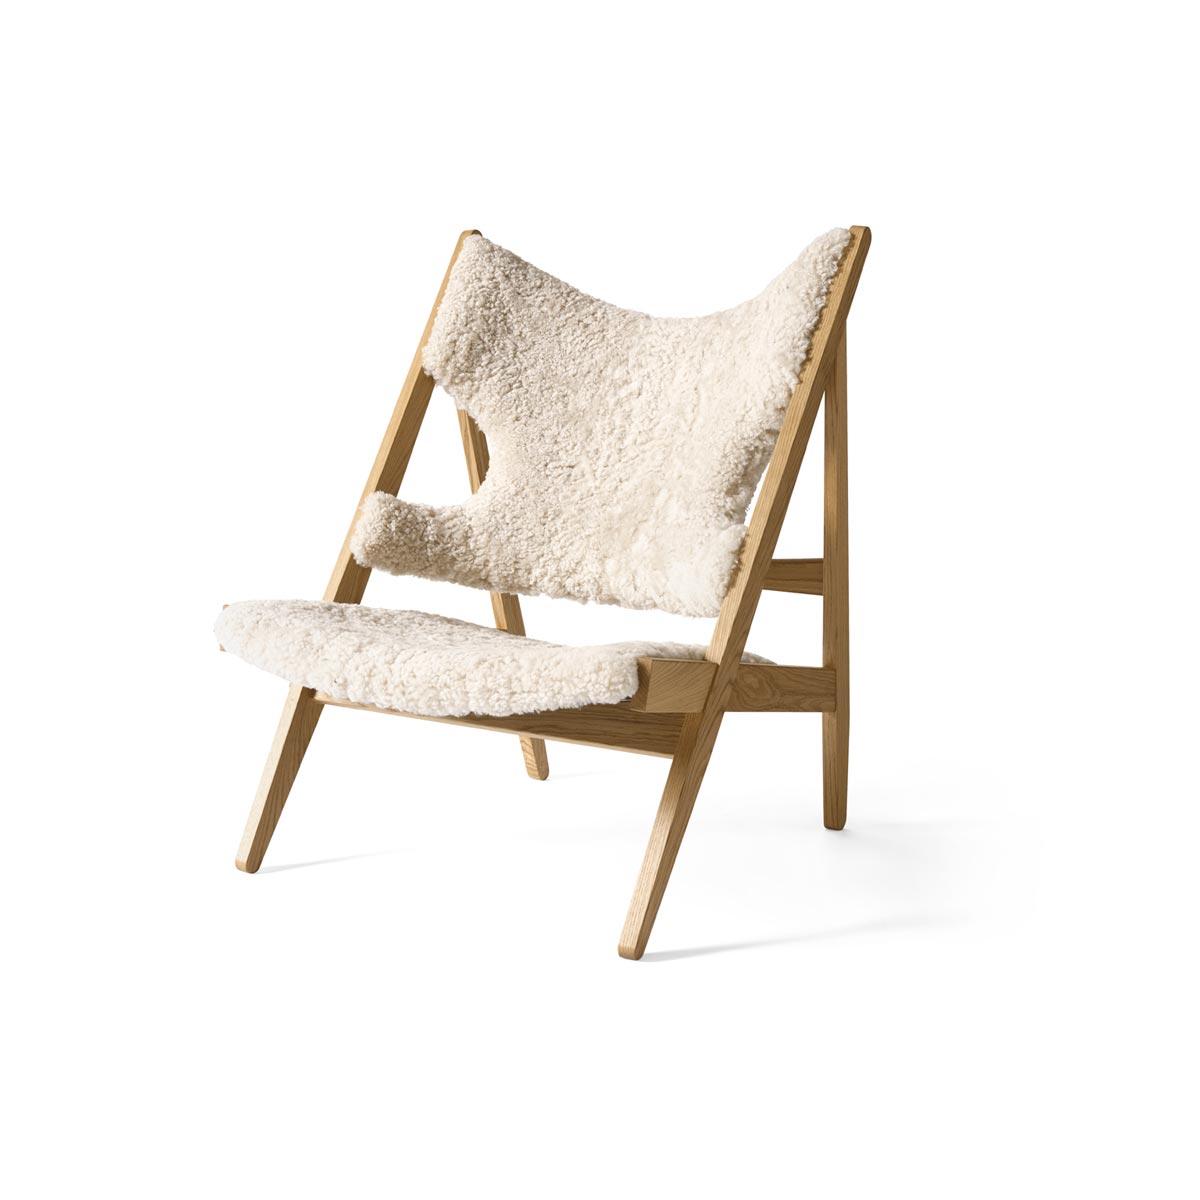 9681649 Knitting Lounge Chair Natural Oak Moonlight 21 Angle 1